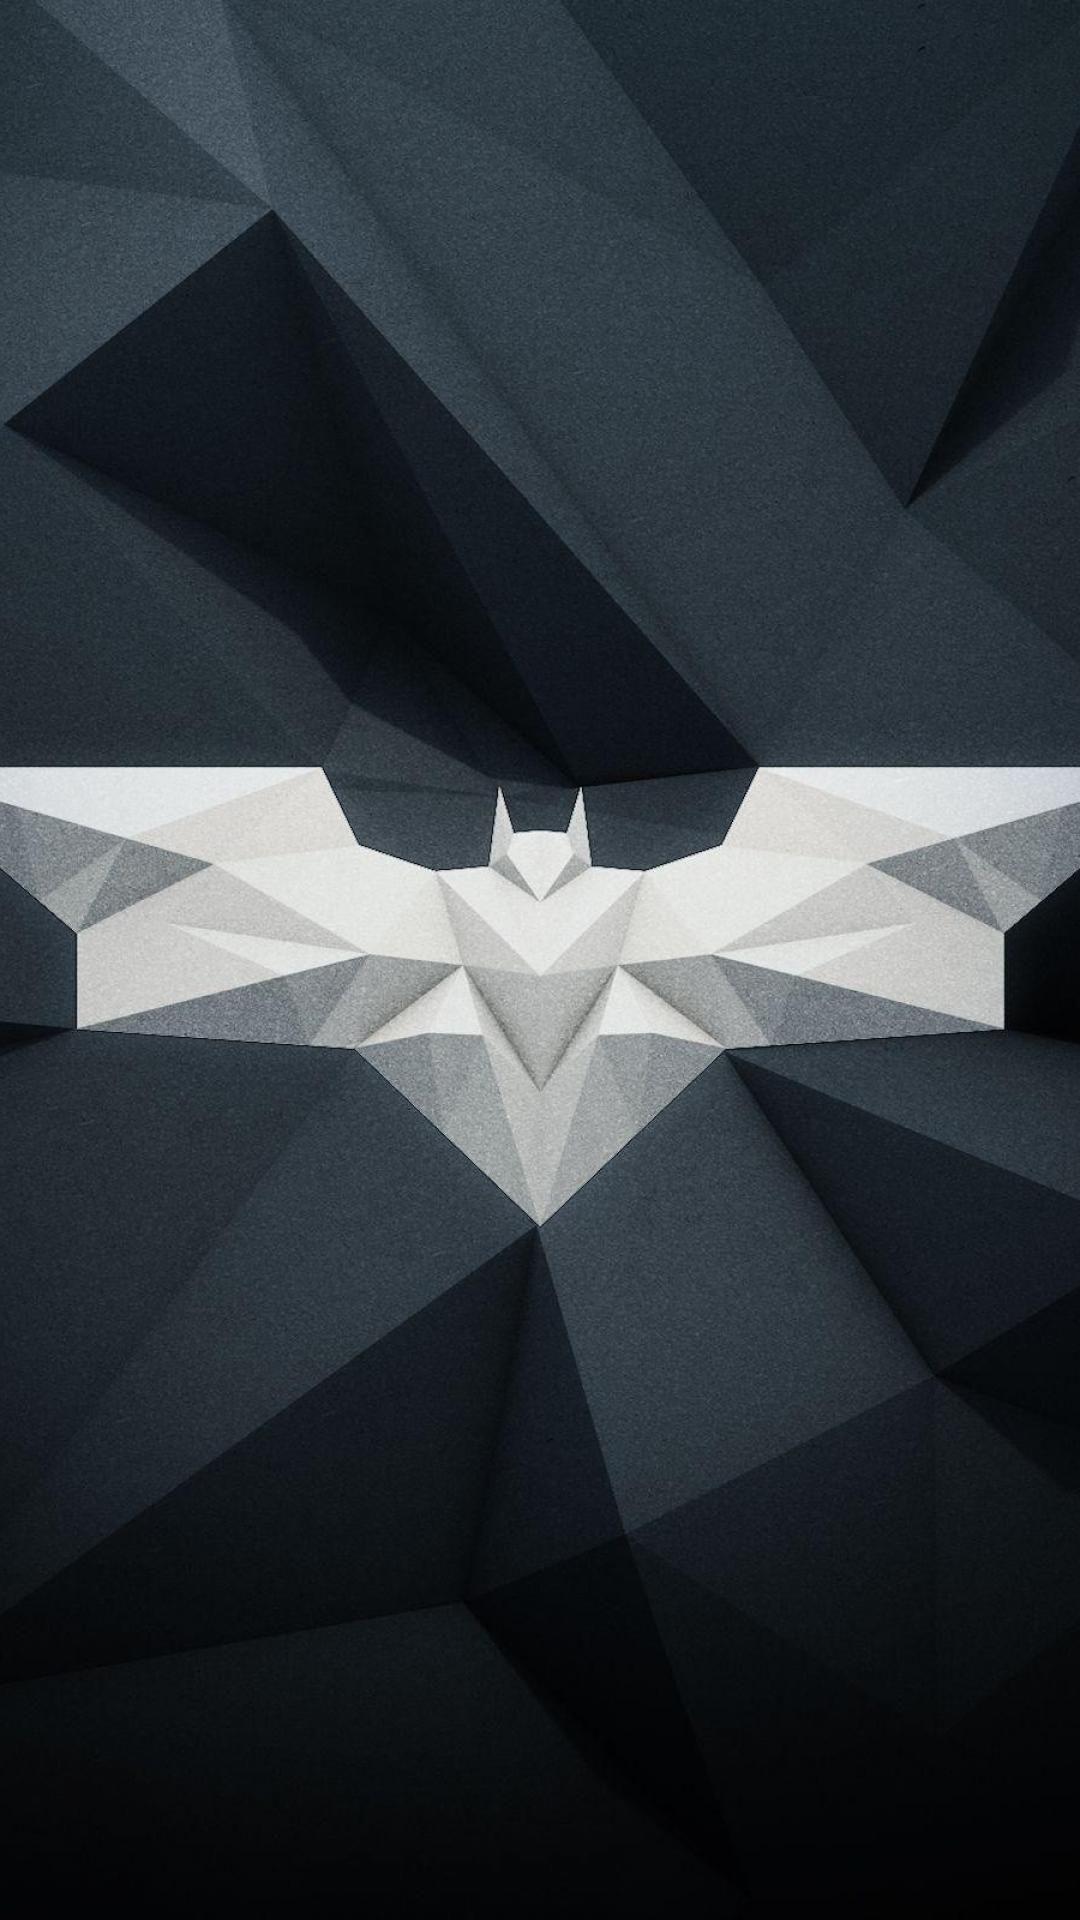 Batman Logo Iphone Wallpapers